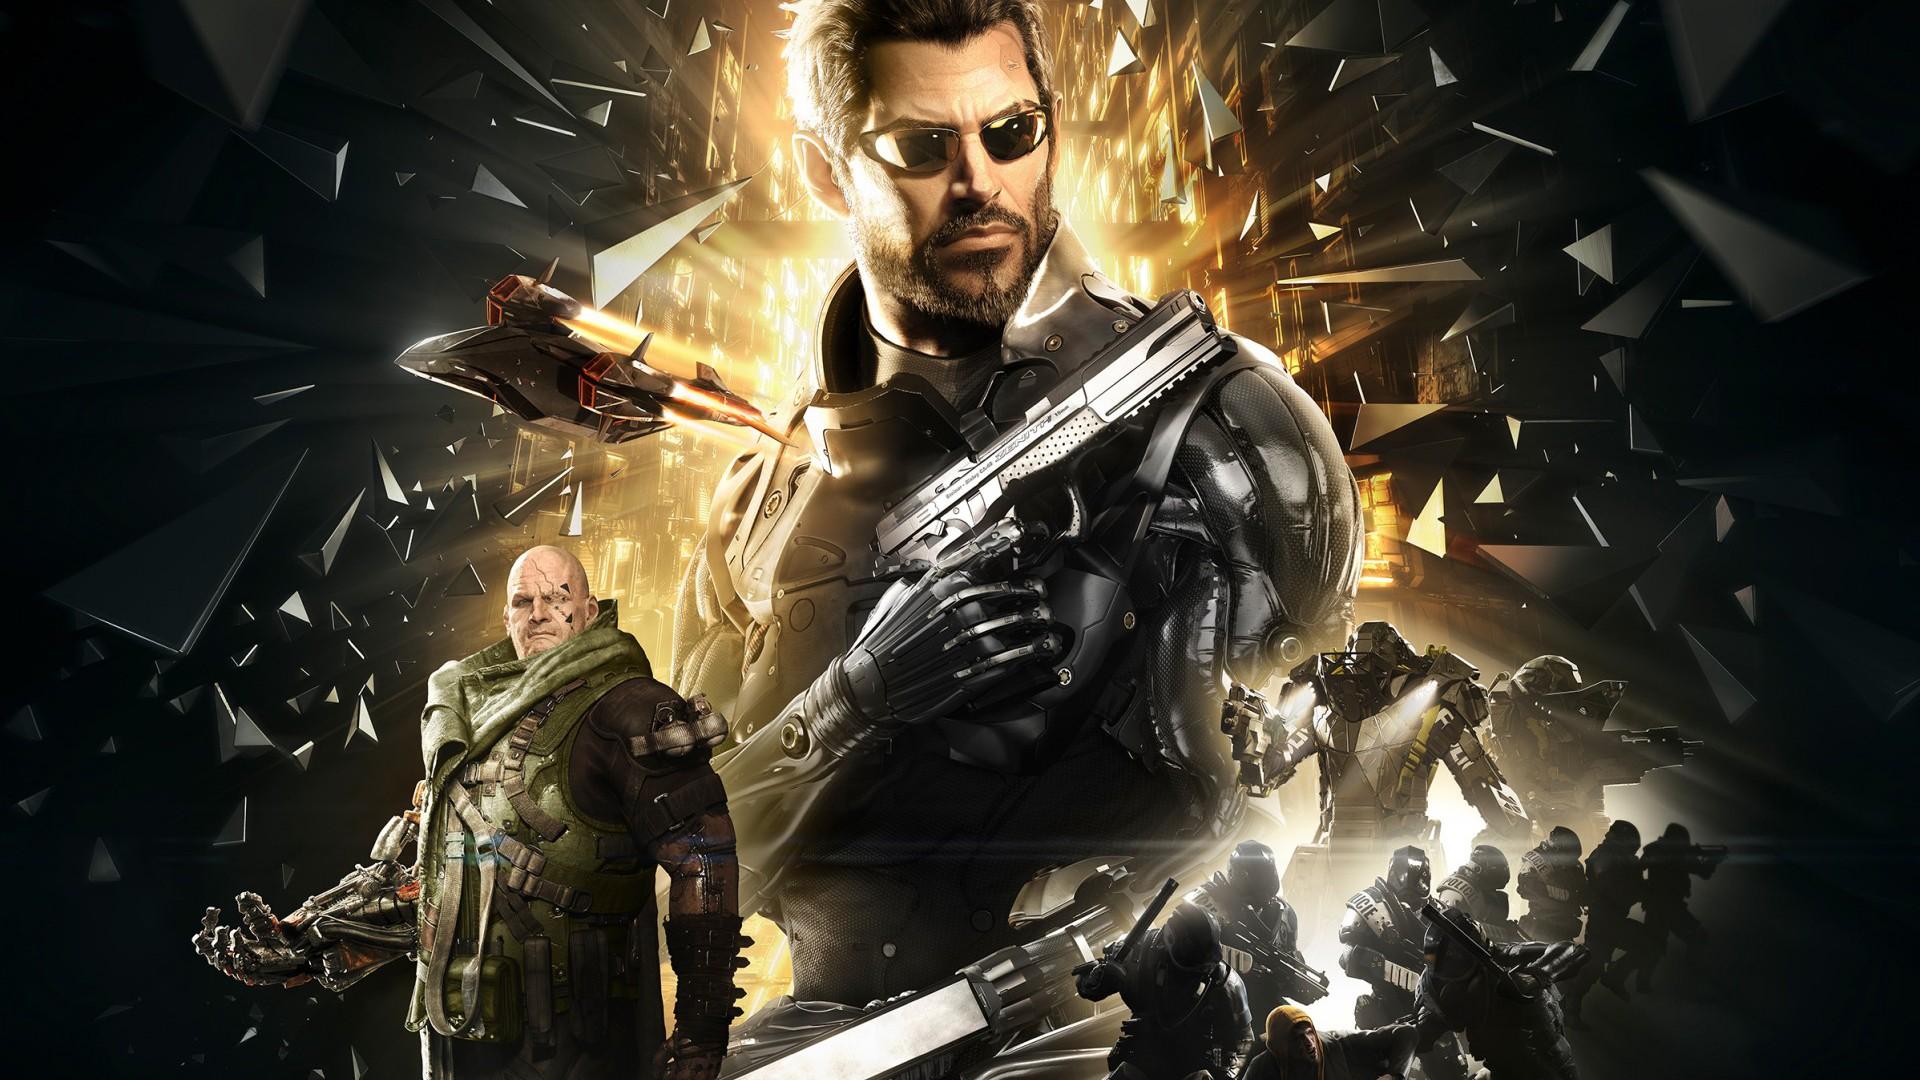 Deus Ex Mankind Divided Wallpapers in Ultra HD  4K  Gameranx